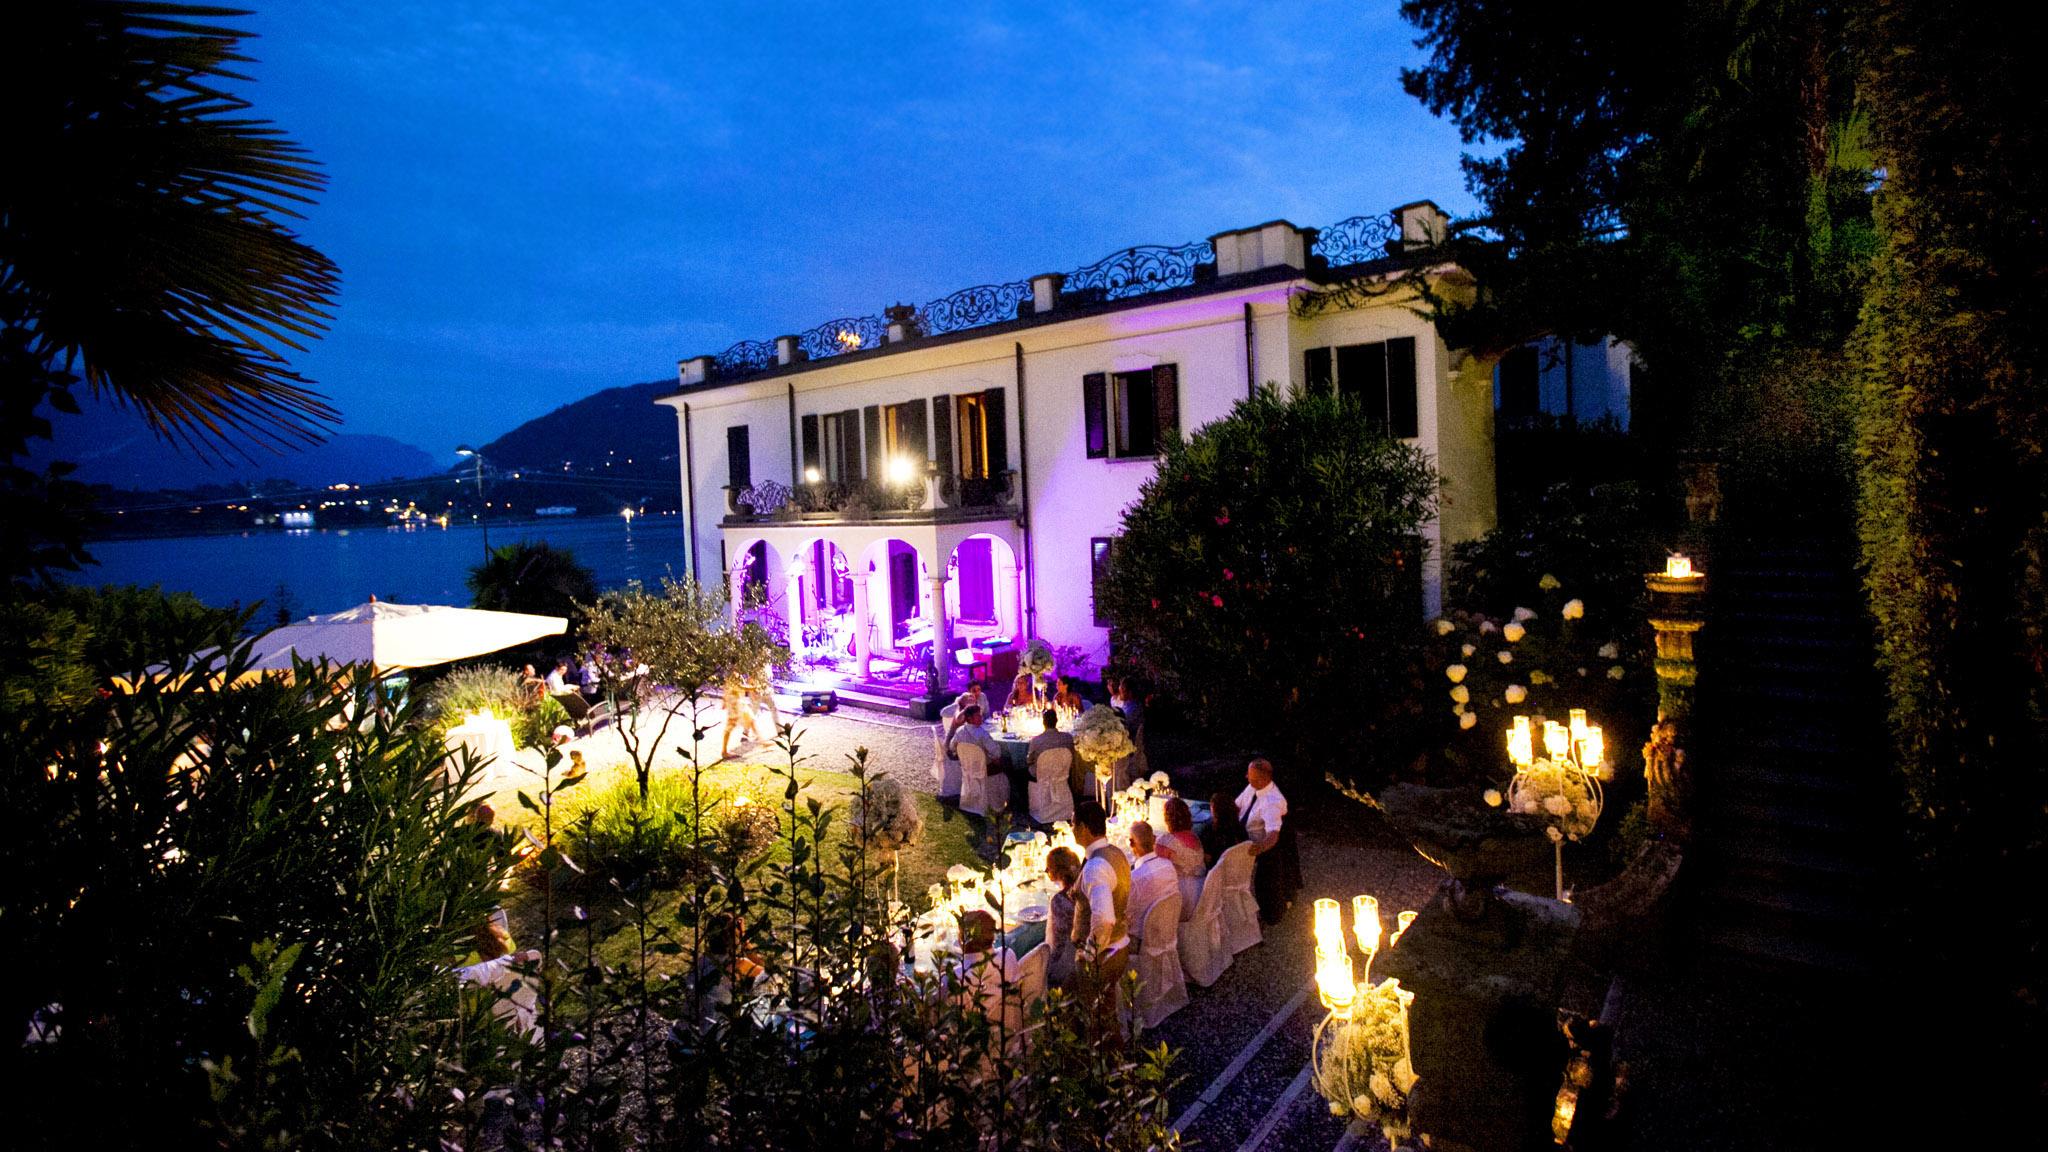 Matrimonio In Villa : Wedding in villa carlotta emma dominic women